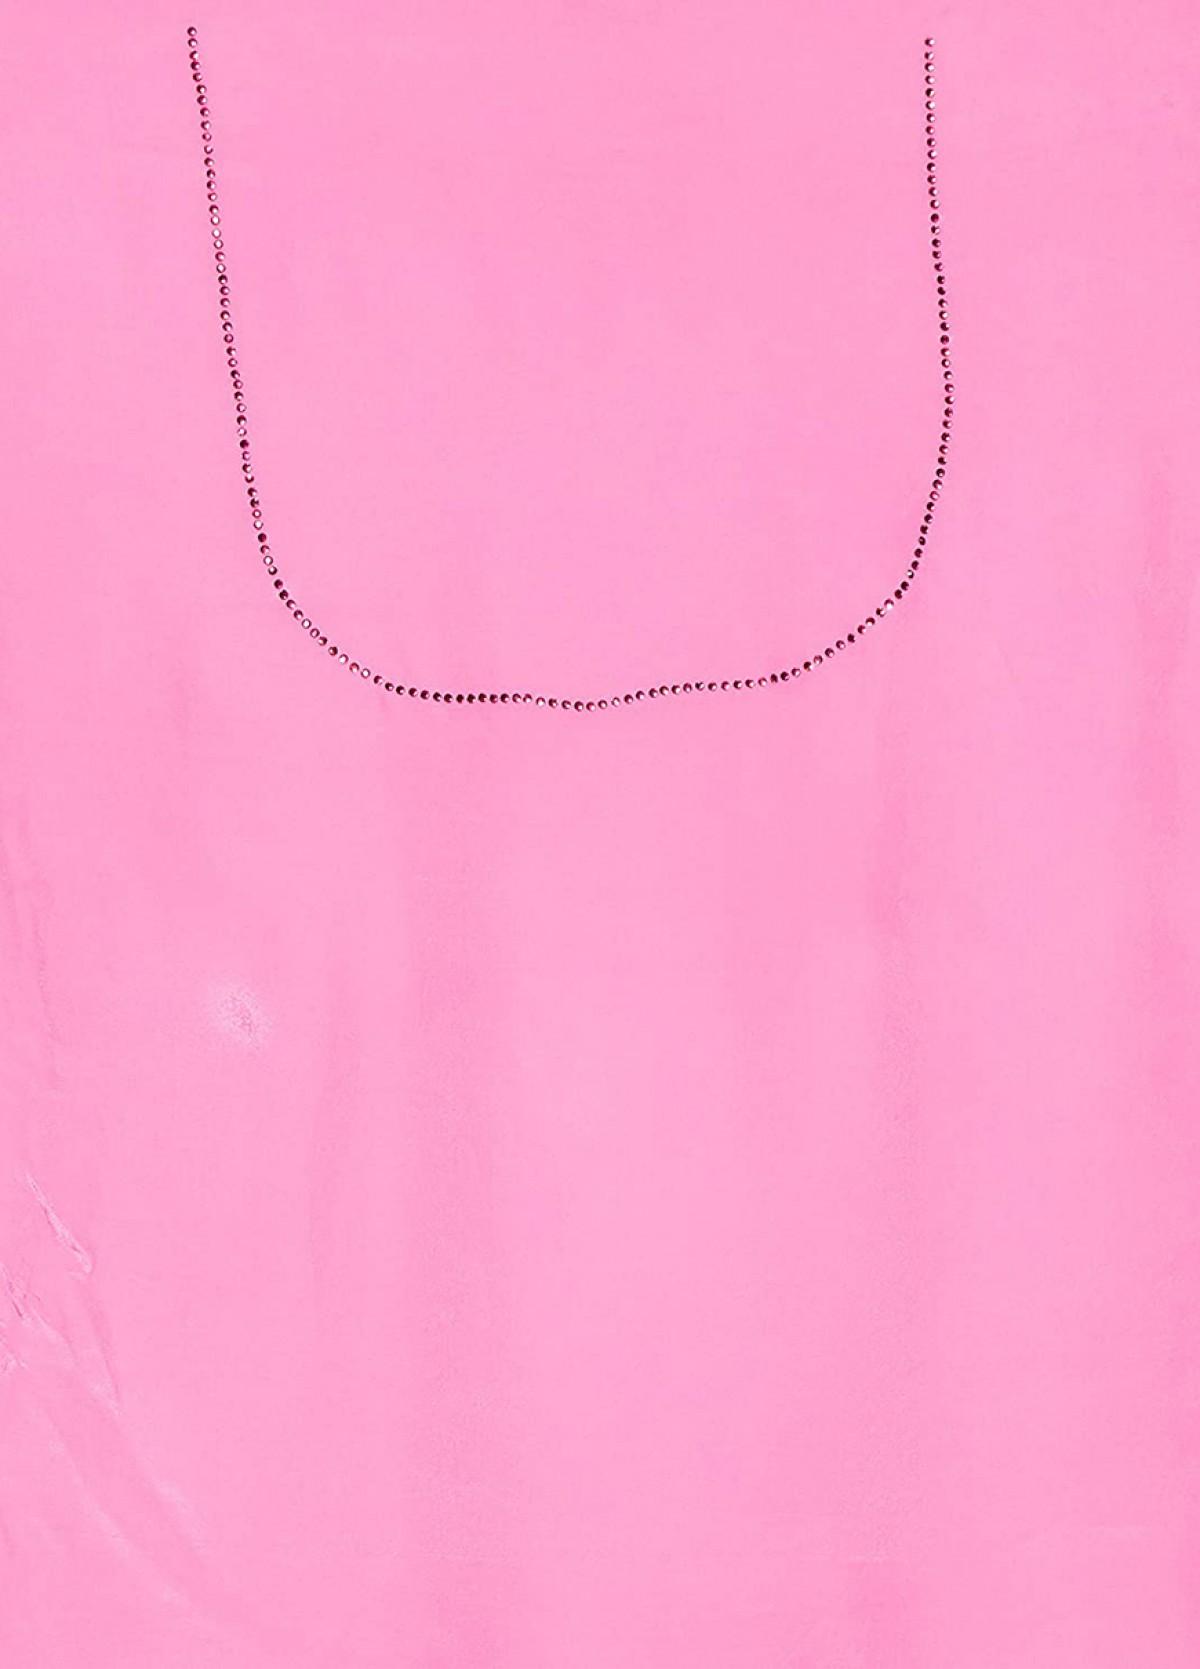 The Regal Blush Sari